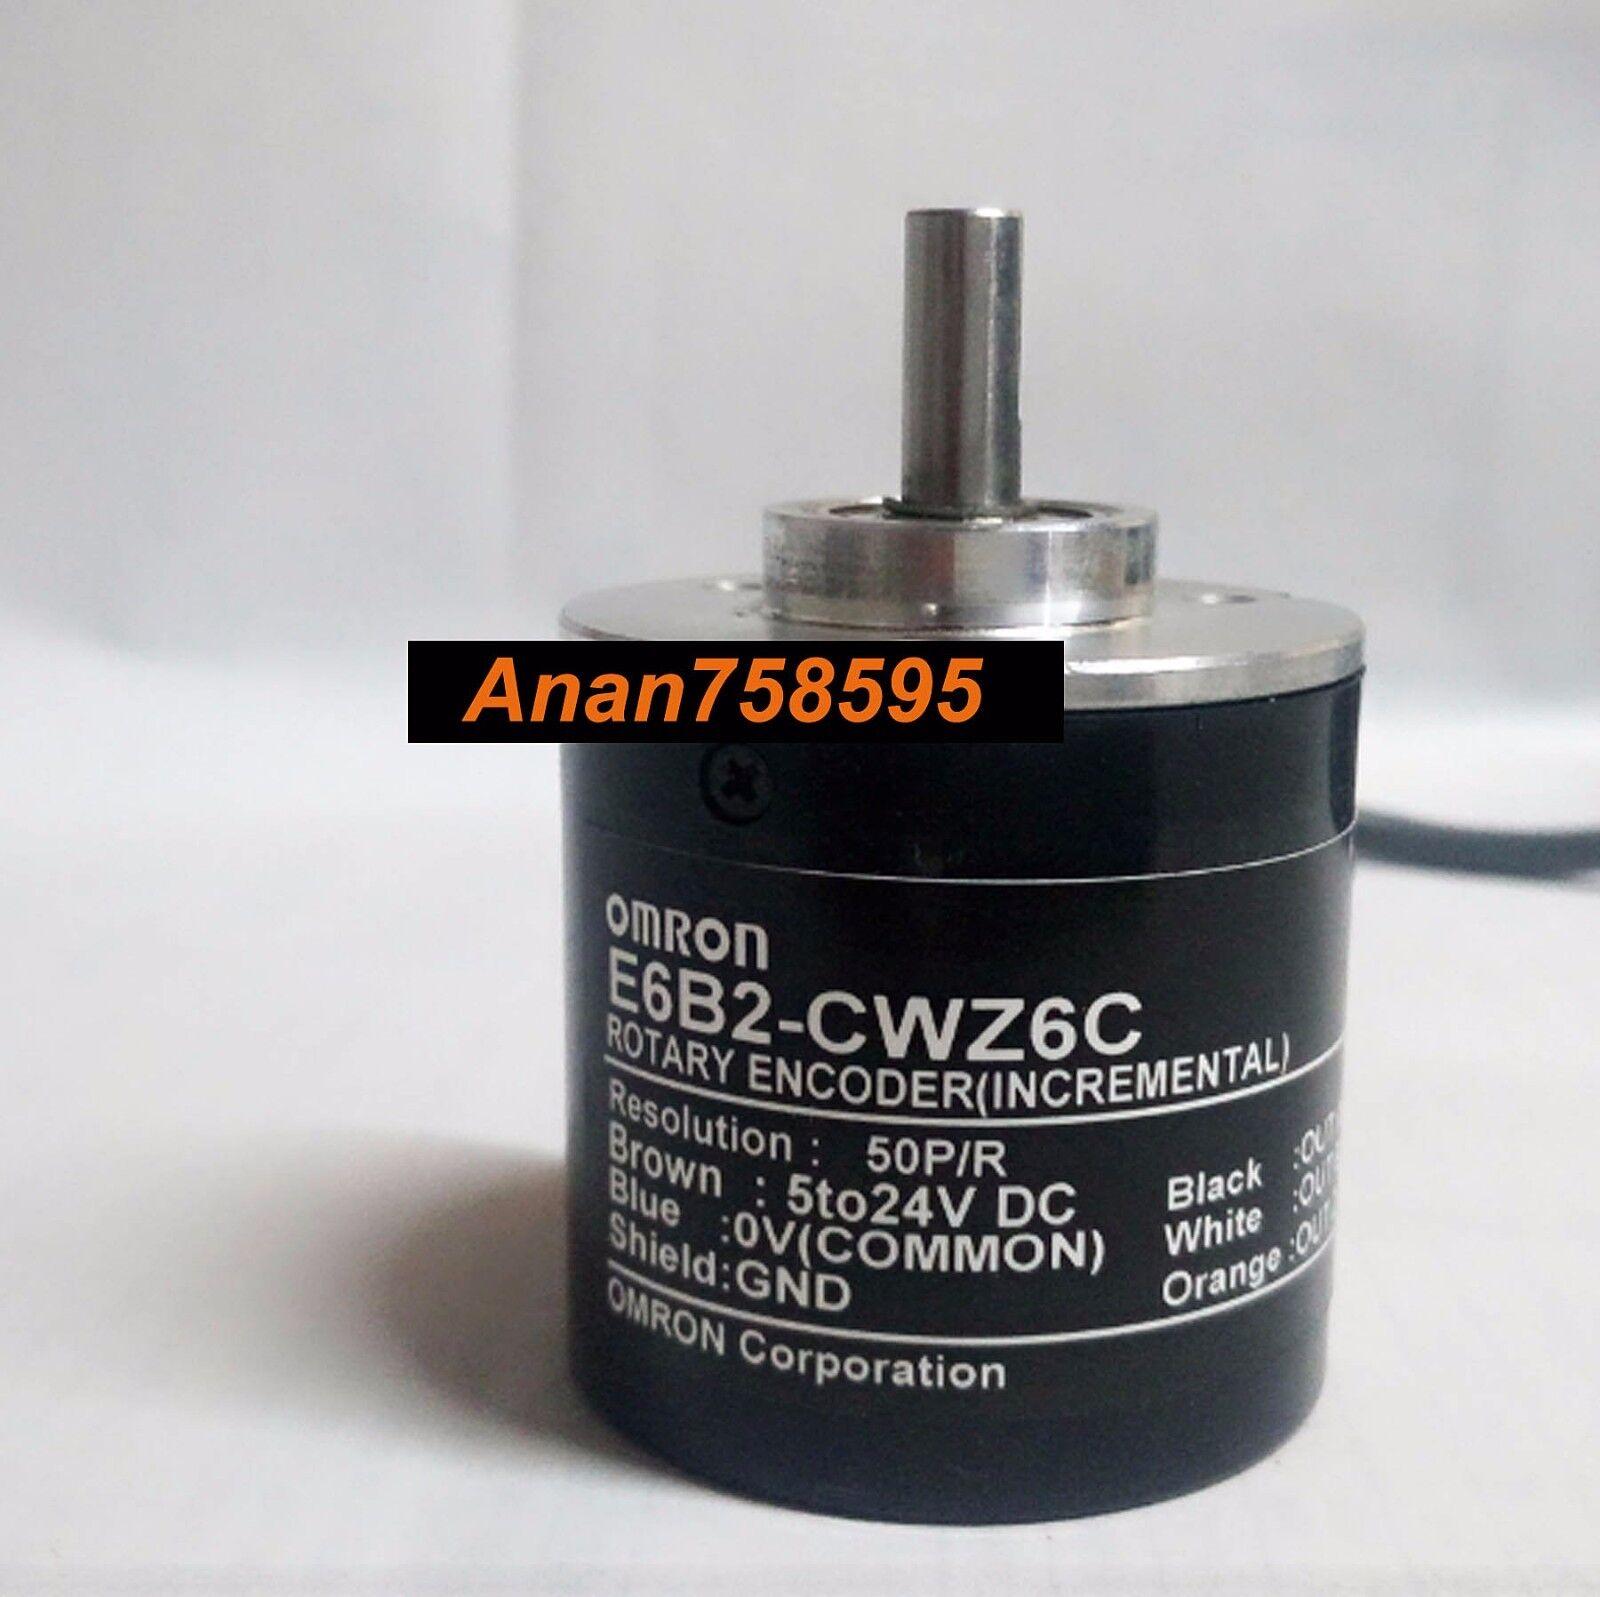 1x Omron 360P incremental Codificador Rotatorio 360p//r 12 ~ 24 V DC E6B2-CWZ5B PNP